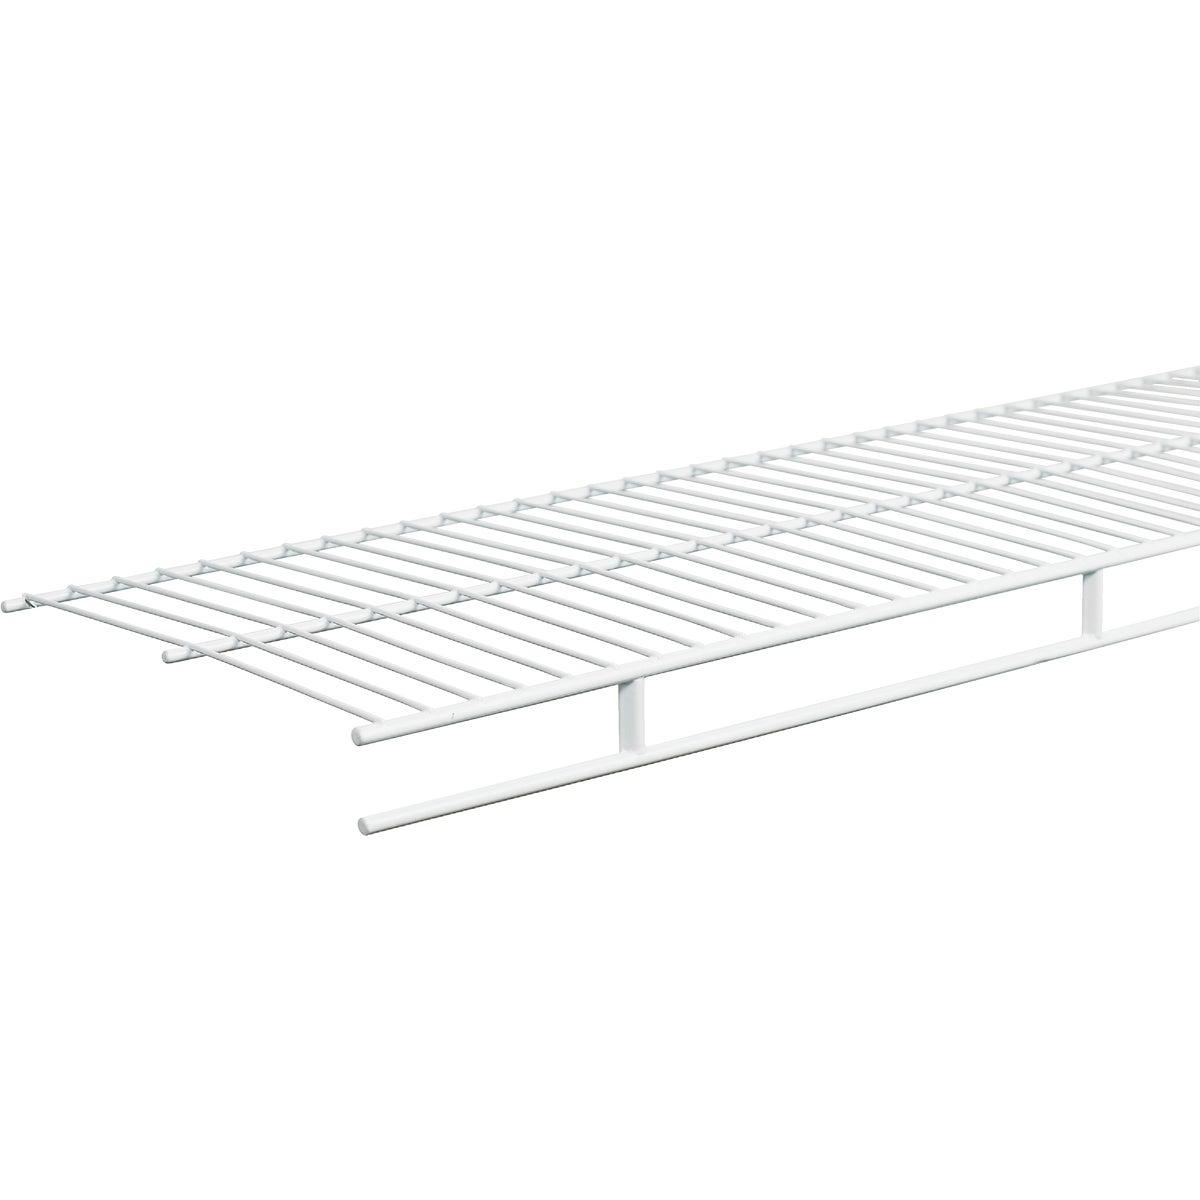 ClosetMaid 12 Ft. W. x 12 In. D. Contractor Pack Ventilated Shelf & Rod Closet Shelf, White (6-Pack)